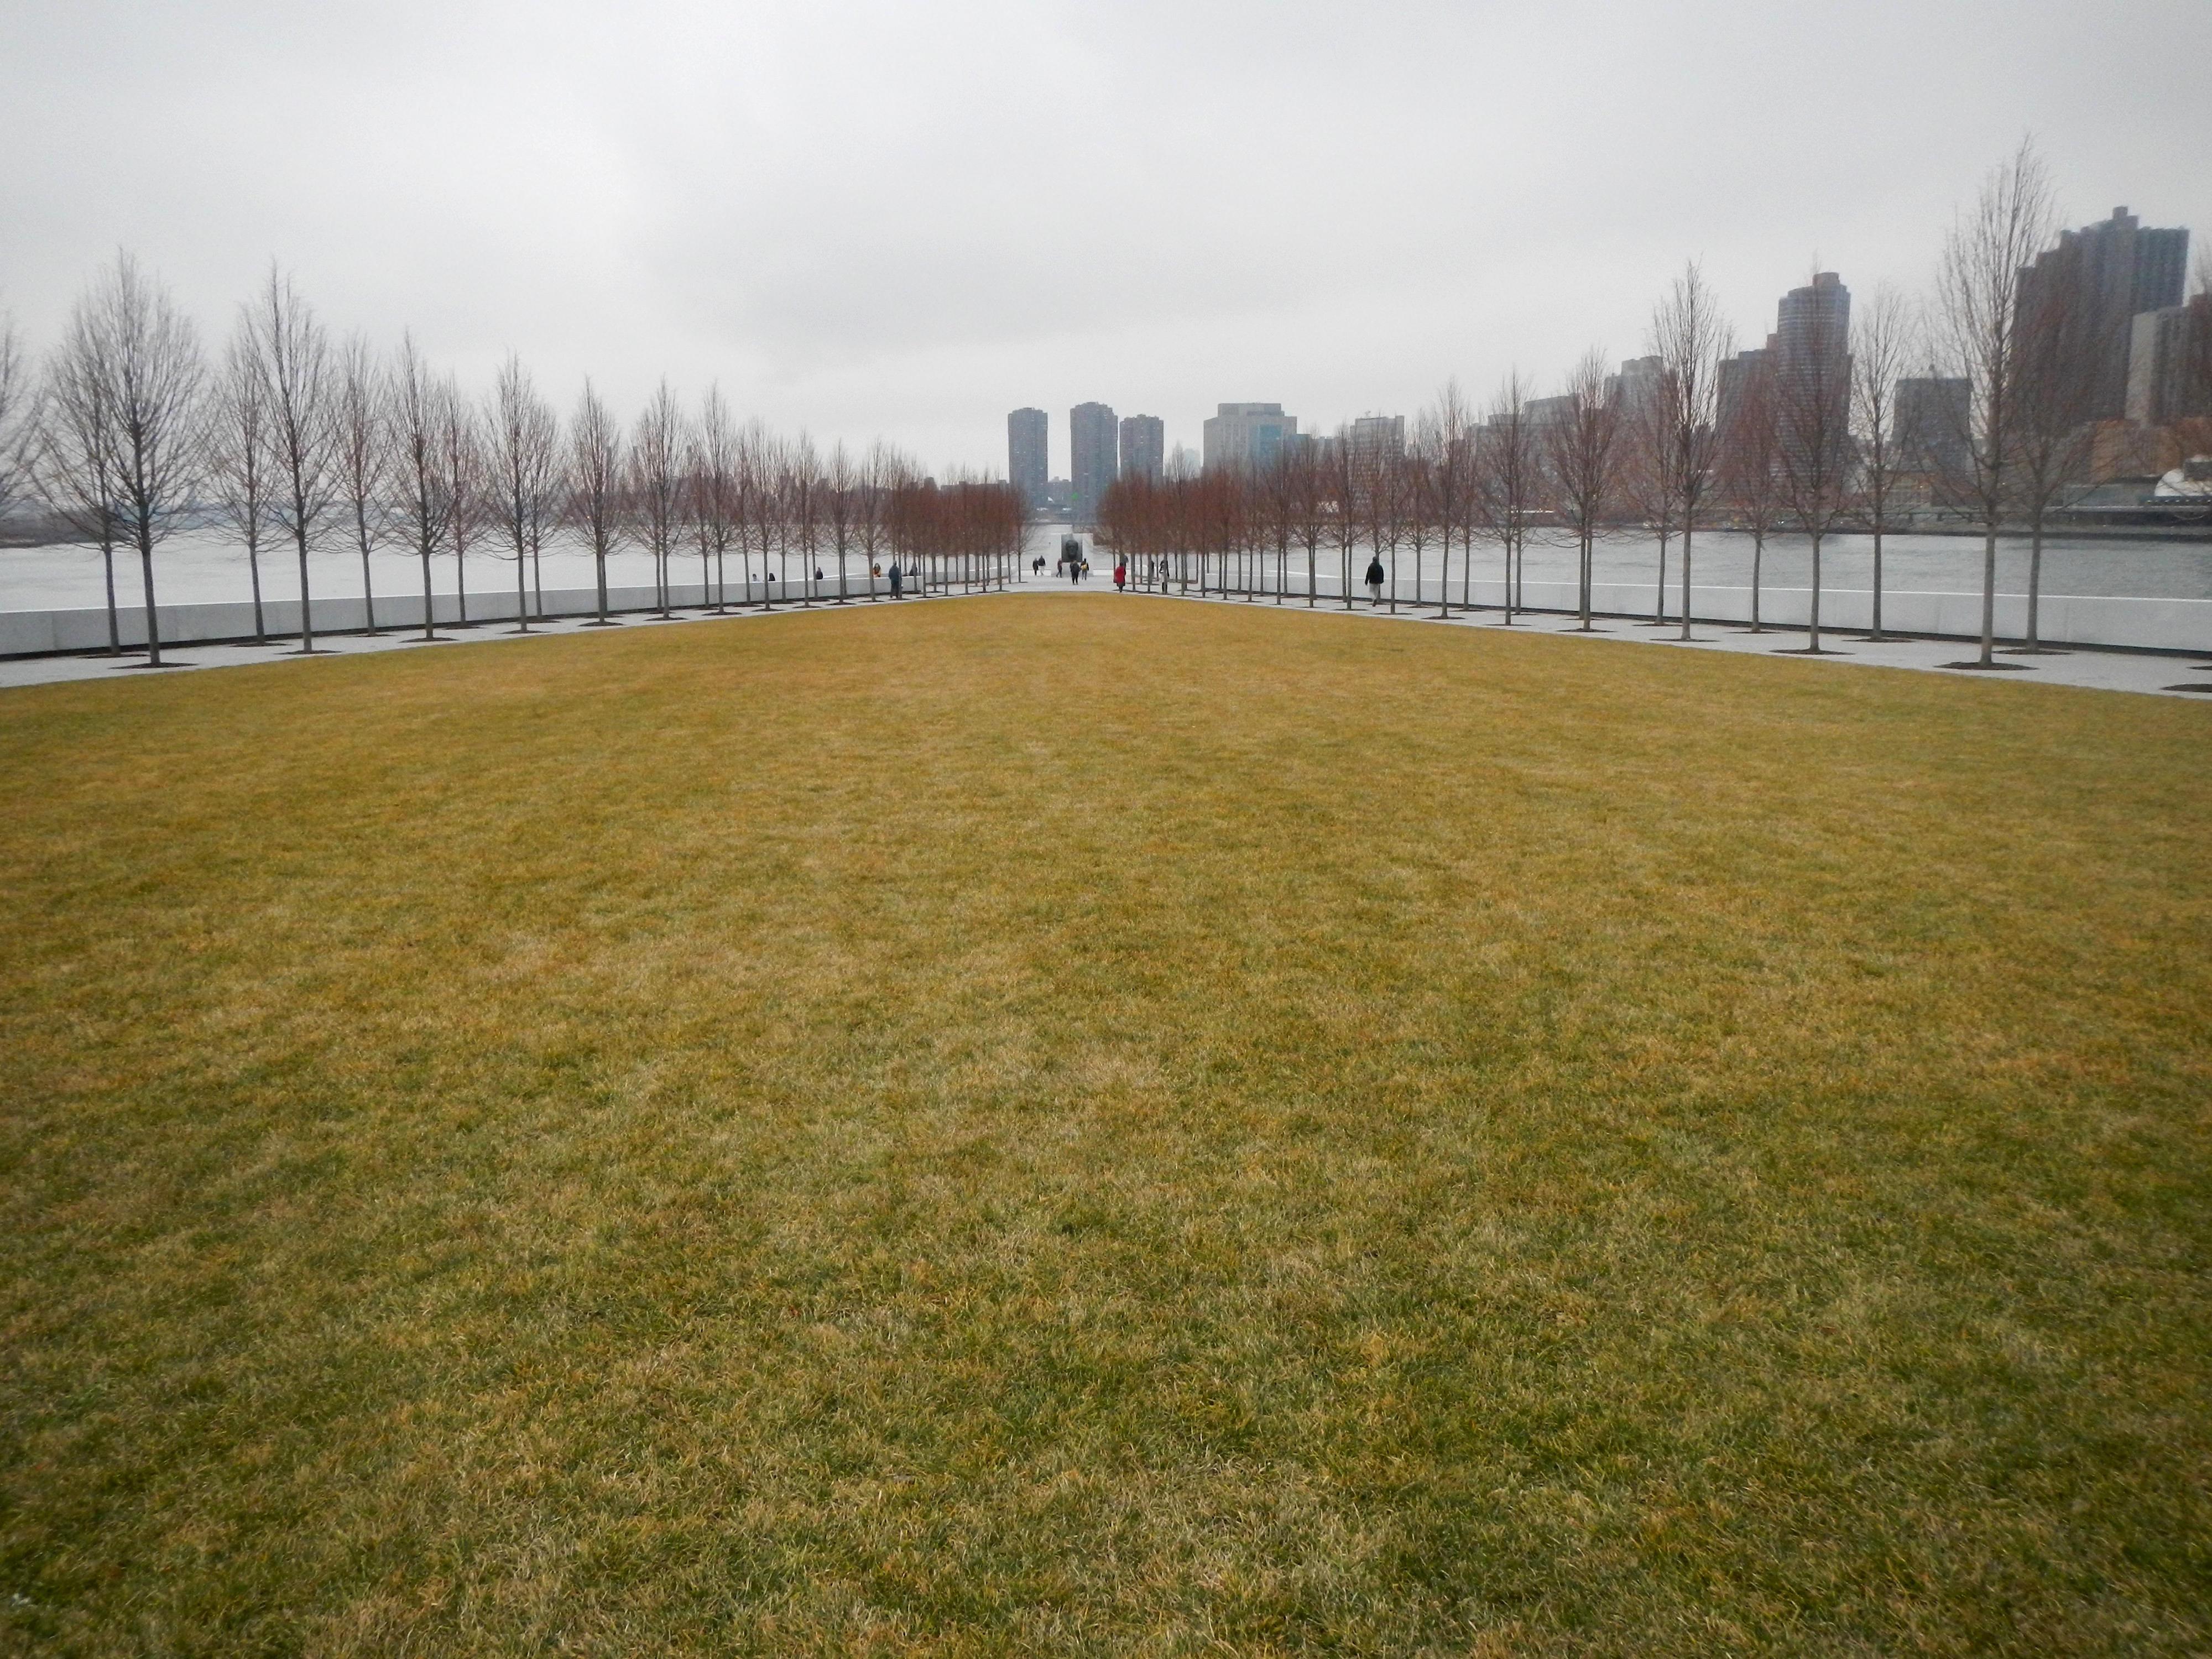 File:FDR 4 Freedoms lawn winter jeh.jpg